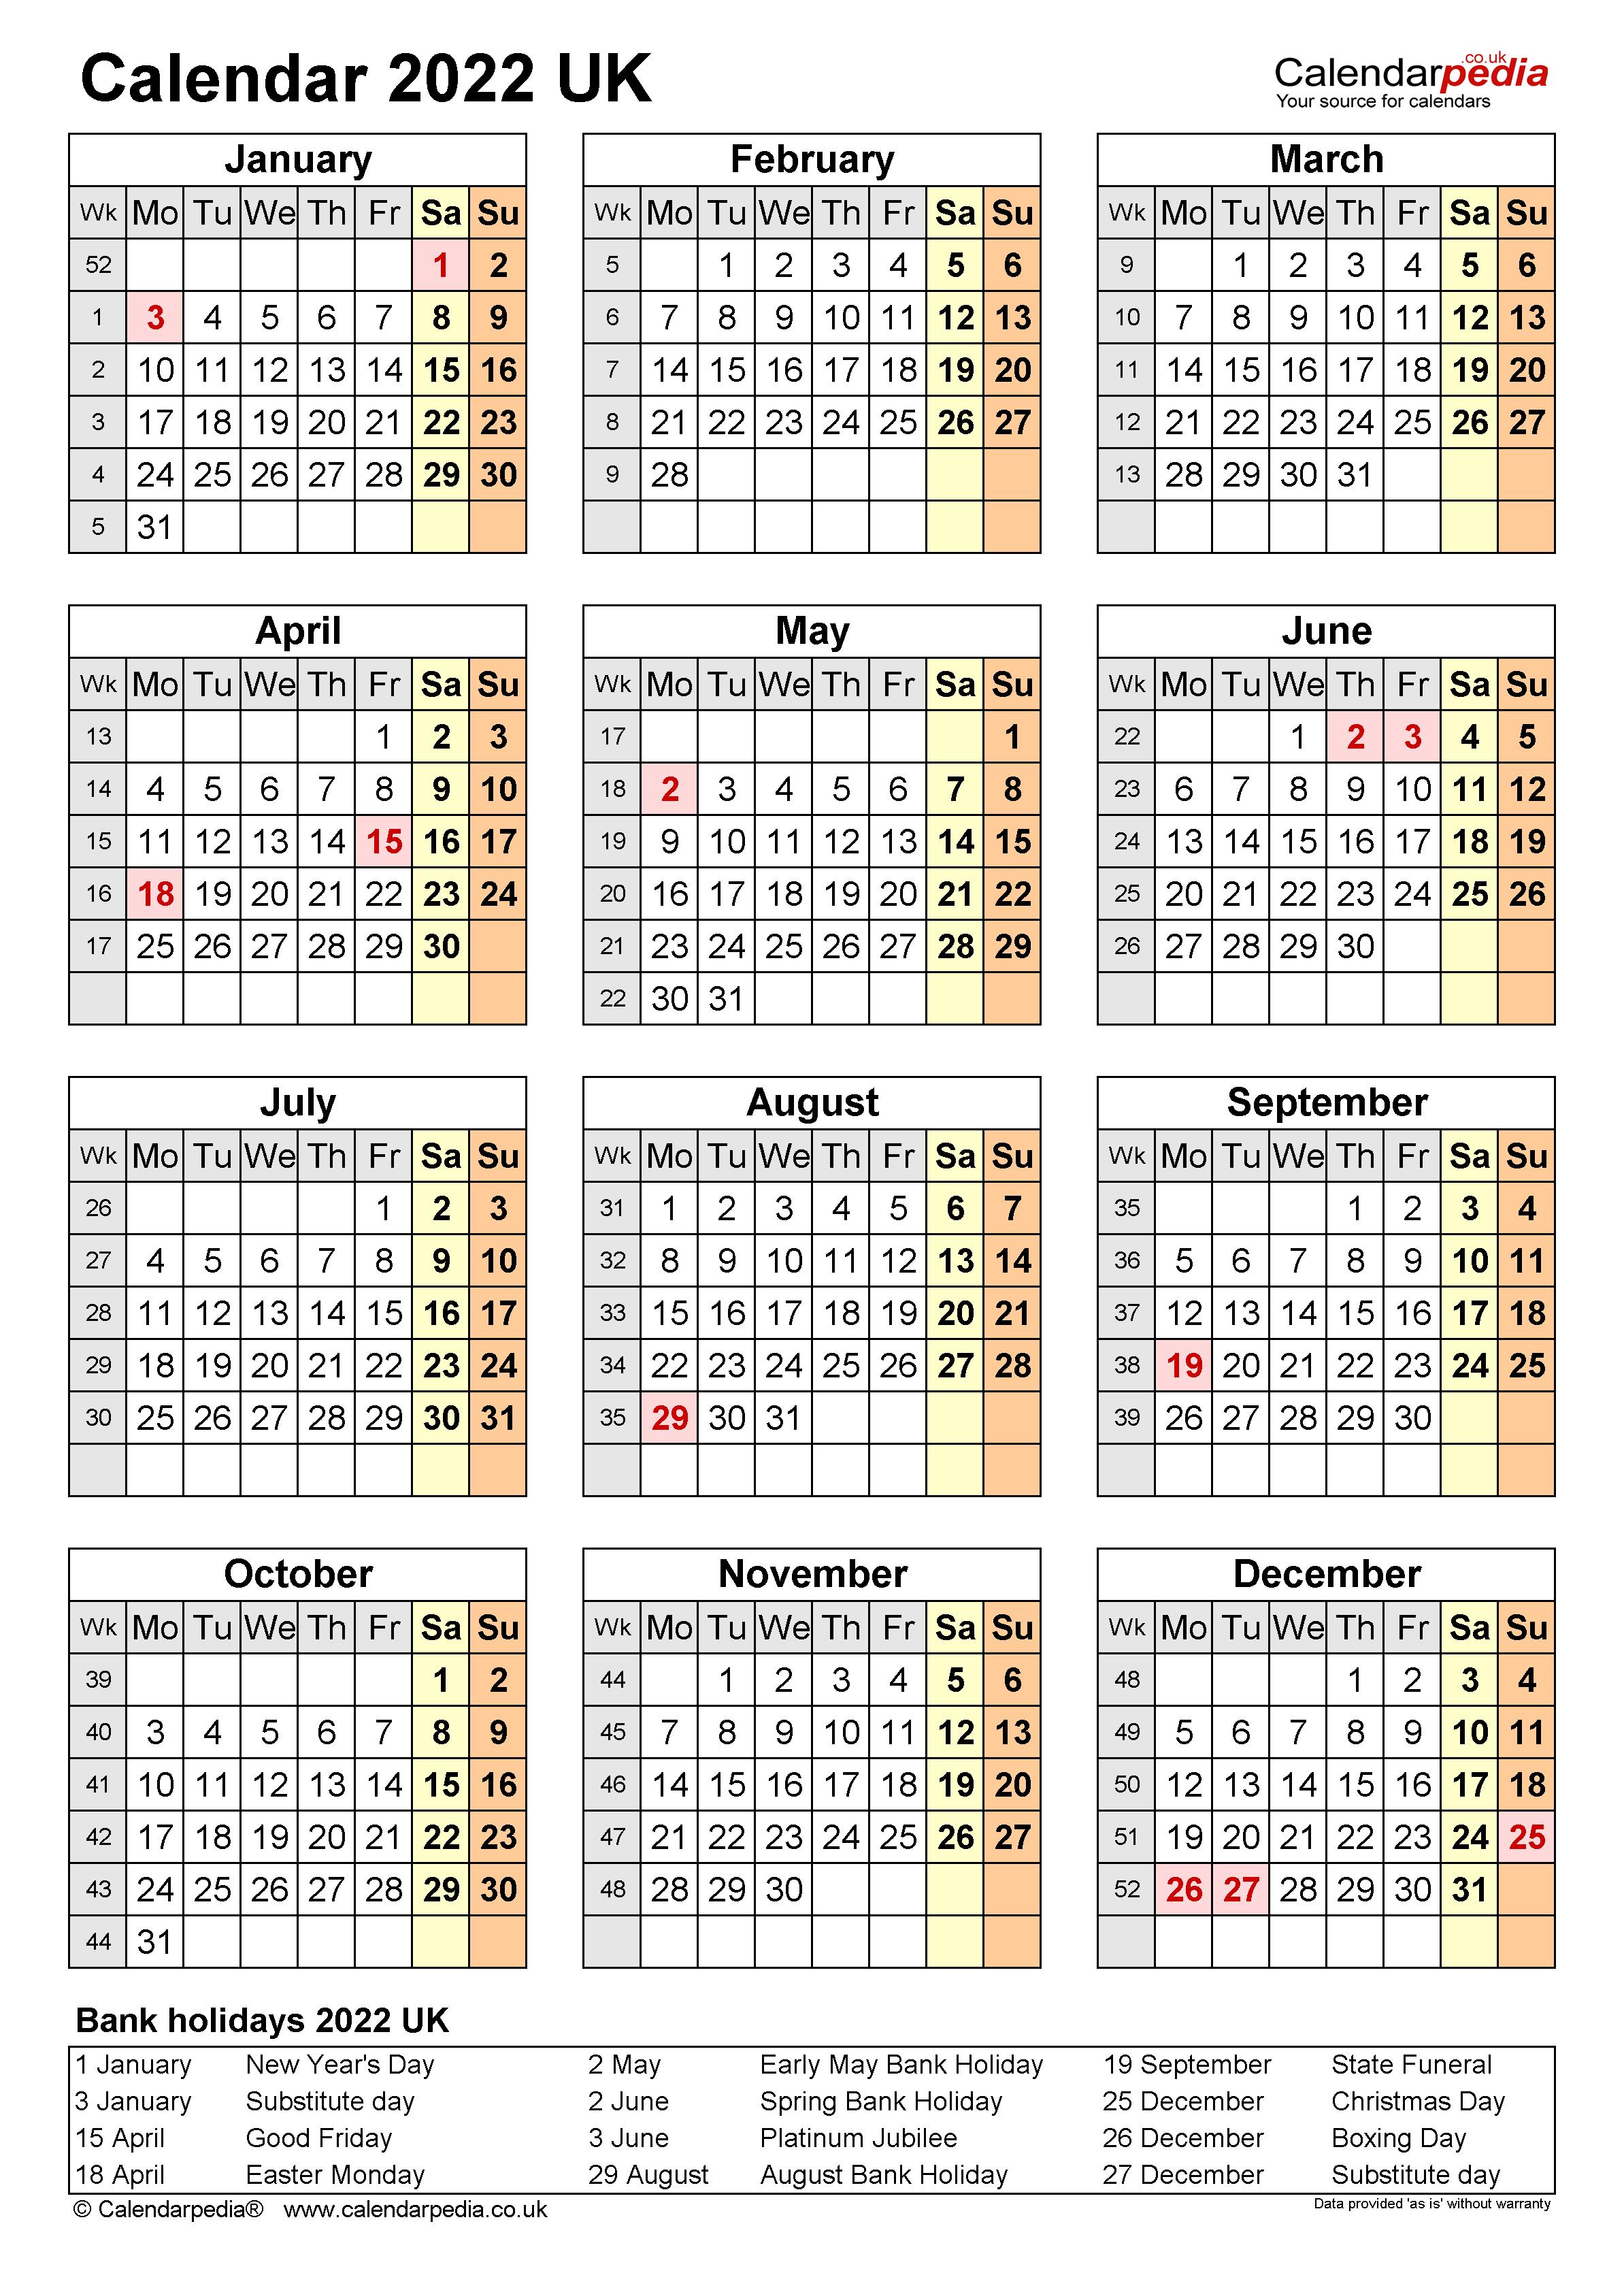 Calendar 2022 (UK) - free printable Microsoft Excel templates